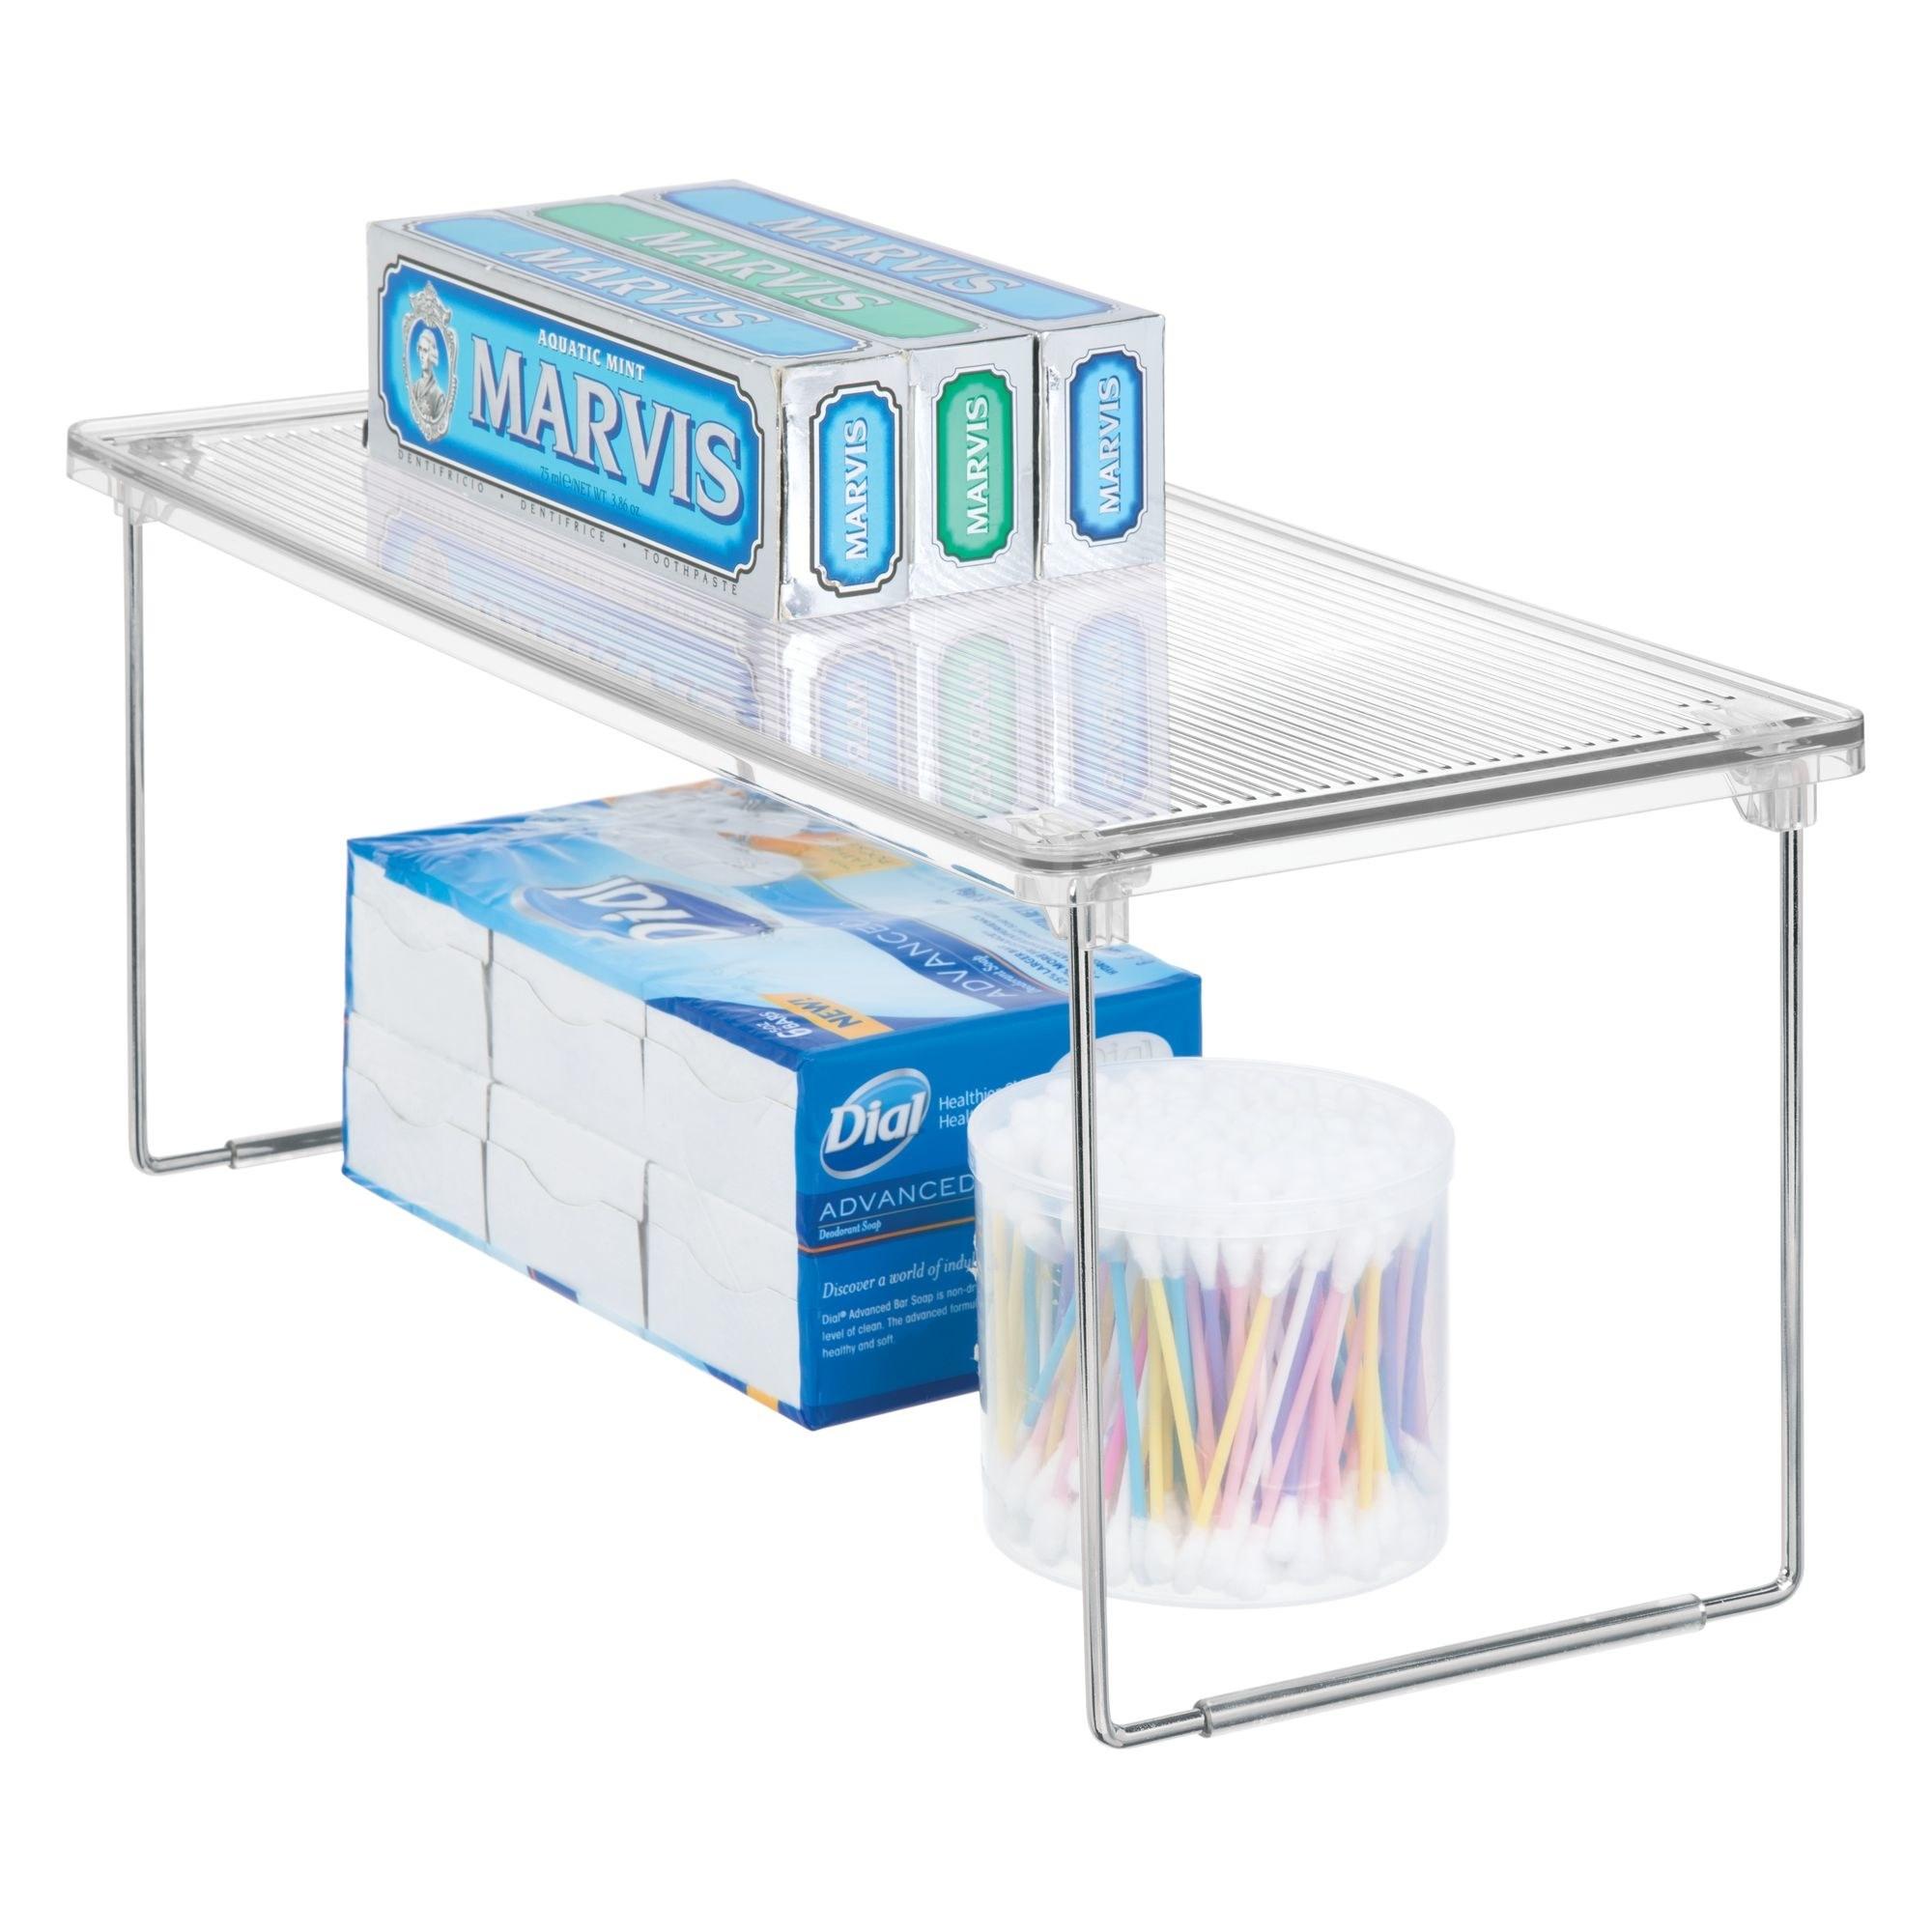 Metal and plastic shelf with bathroom toiletries